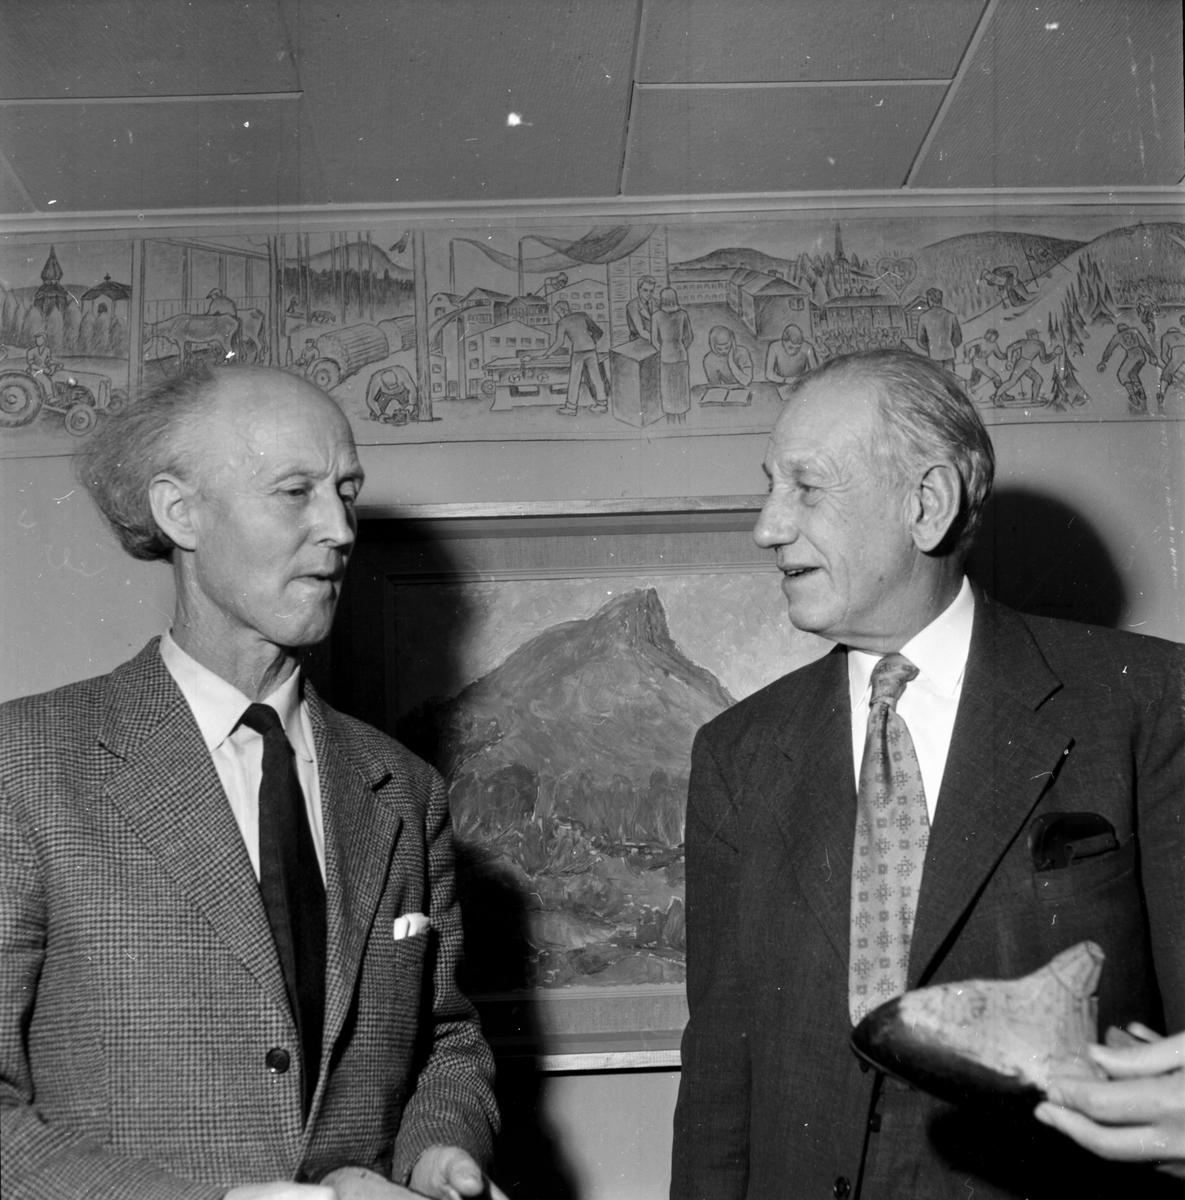 Clahr,Emil,Konstnär Edsbyn 3 jan 1960